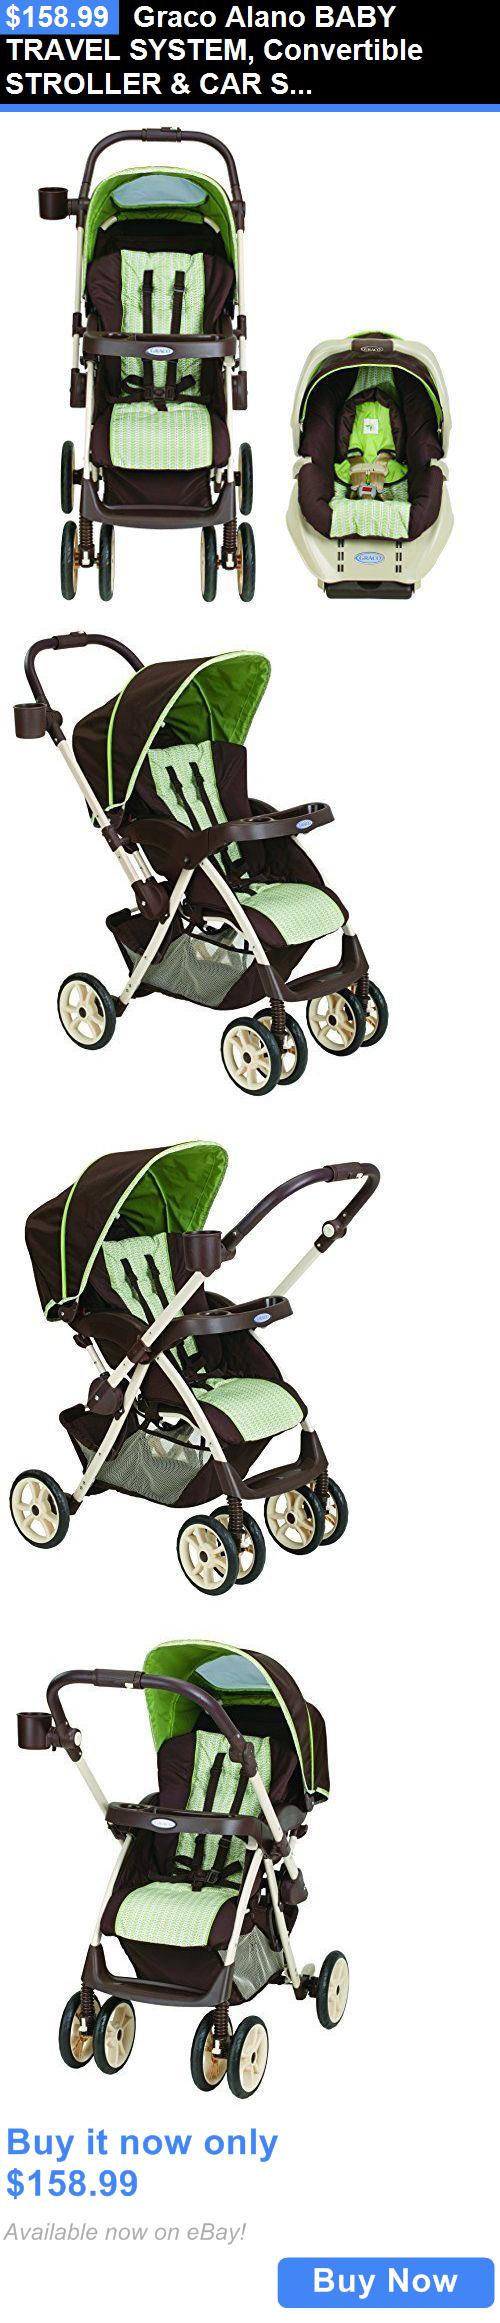 baby kid stuff: Graco Alano Baby Travel System ...